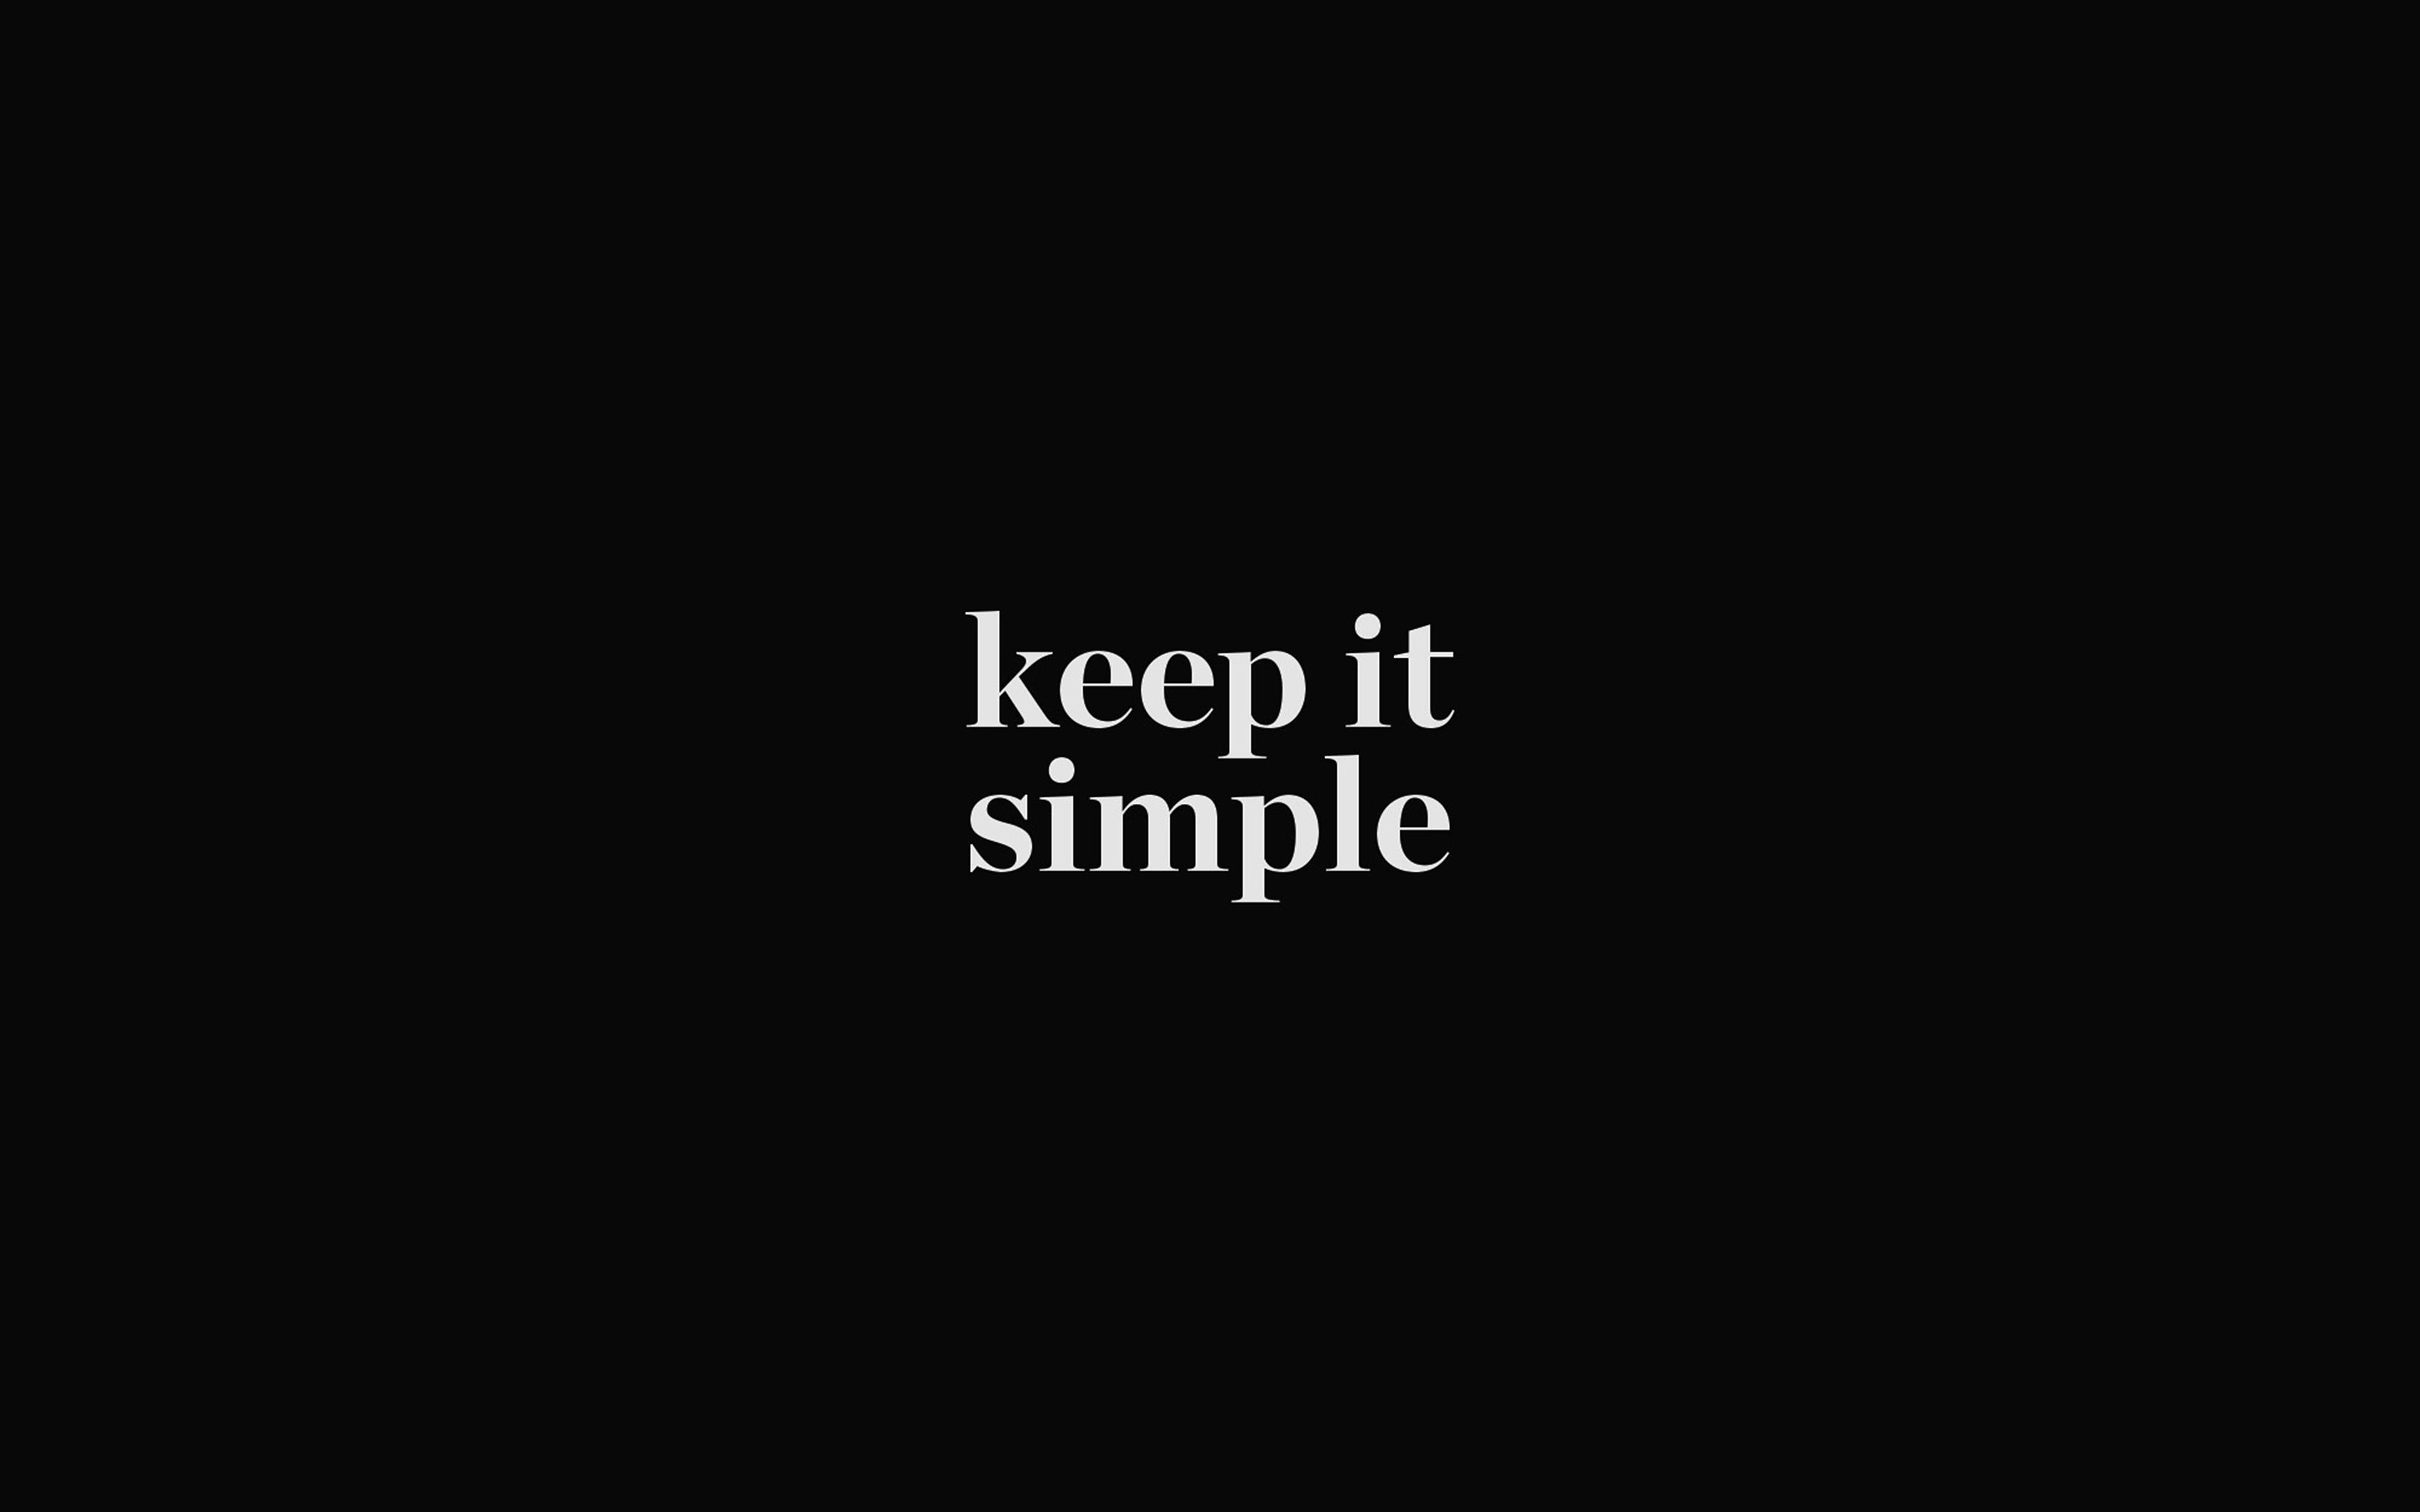 Aw75 Keep It Simple Word Quote Dark Illustration Art Wallpaper